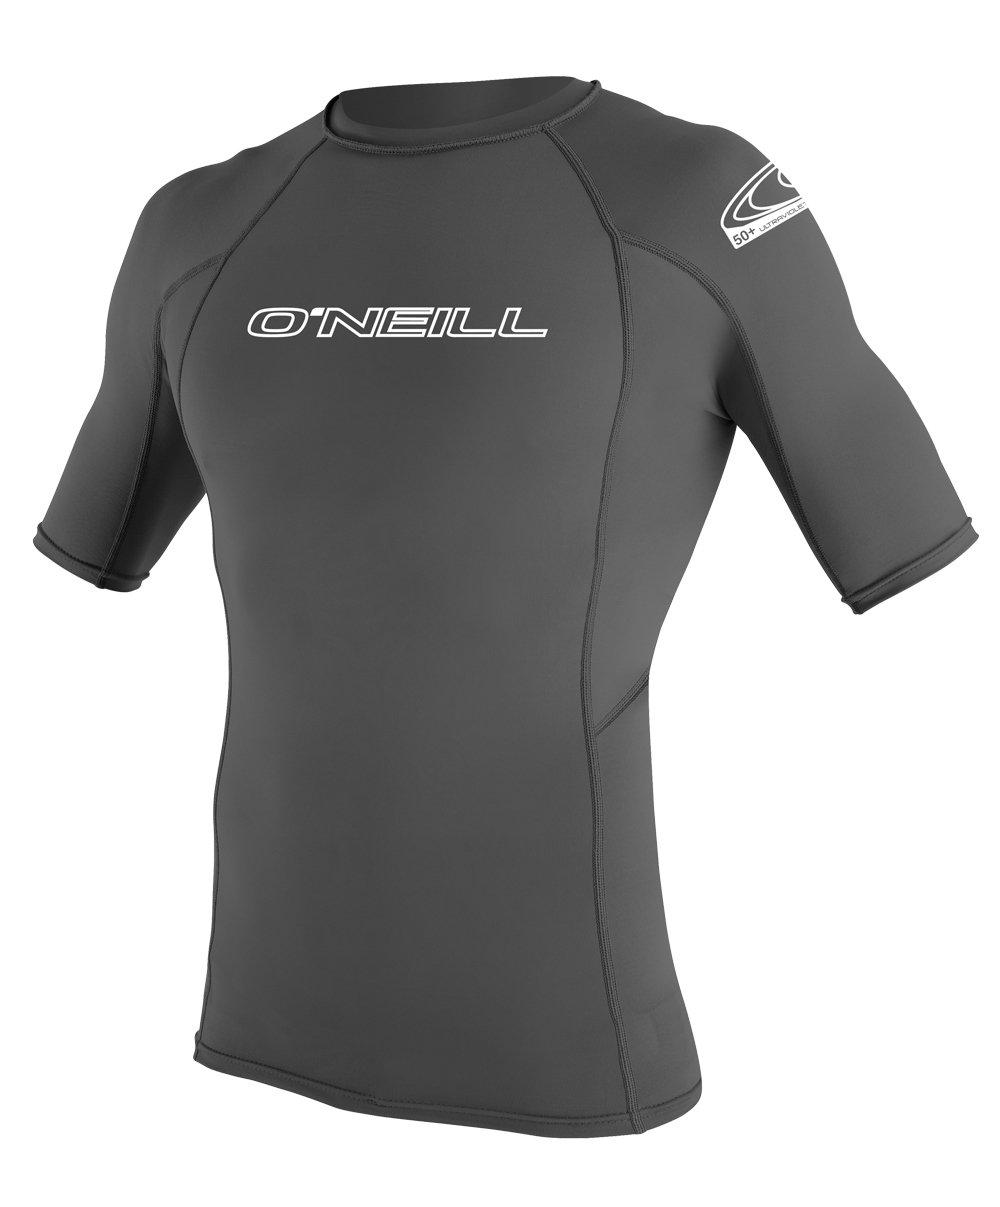 O'Neill Wetsuits Men's Basic Skins UPF 50+ Short Sleeve Rash Guard, Graphite, Medium